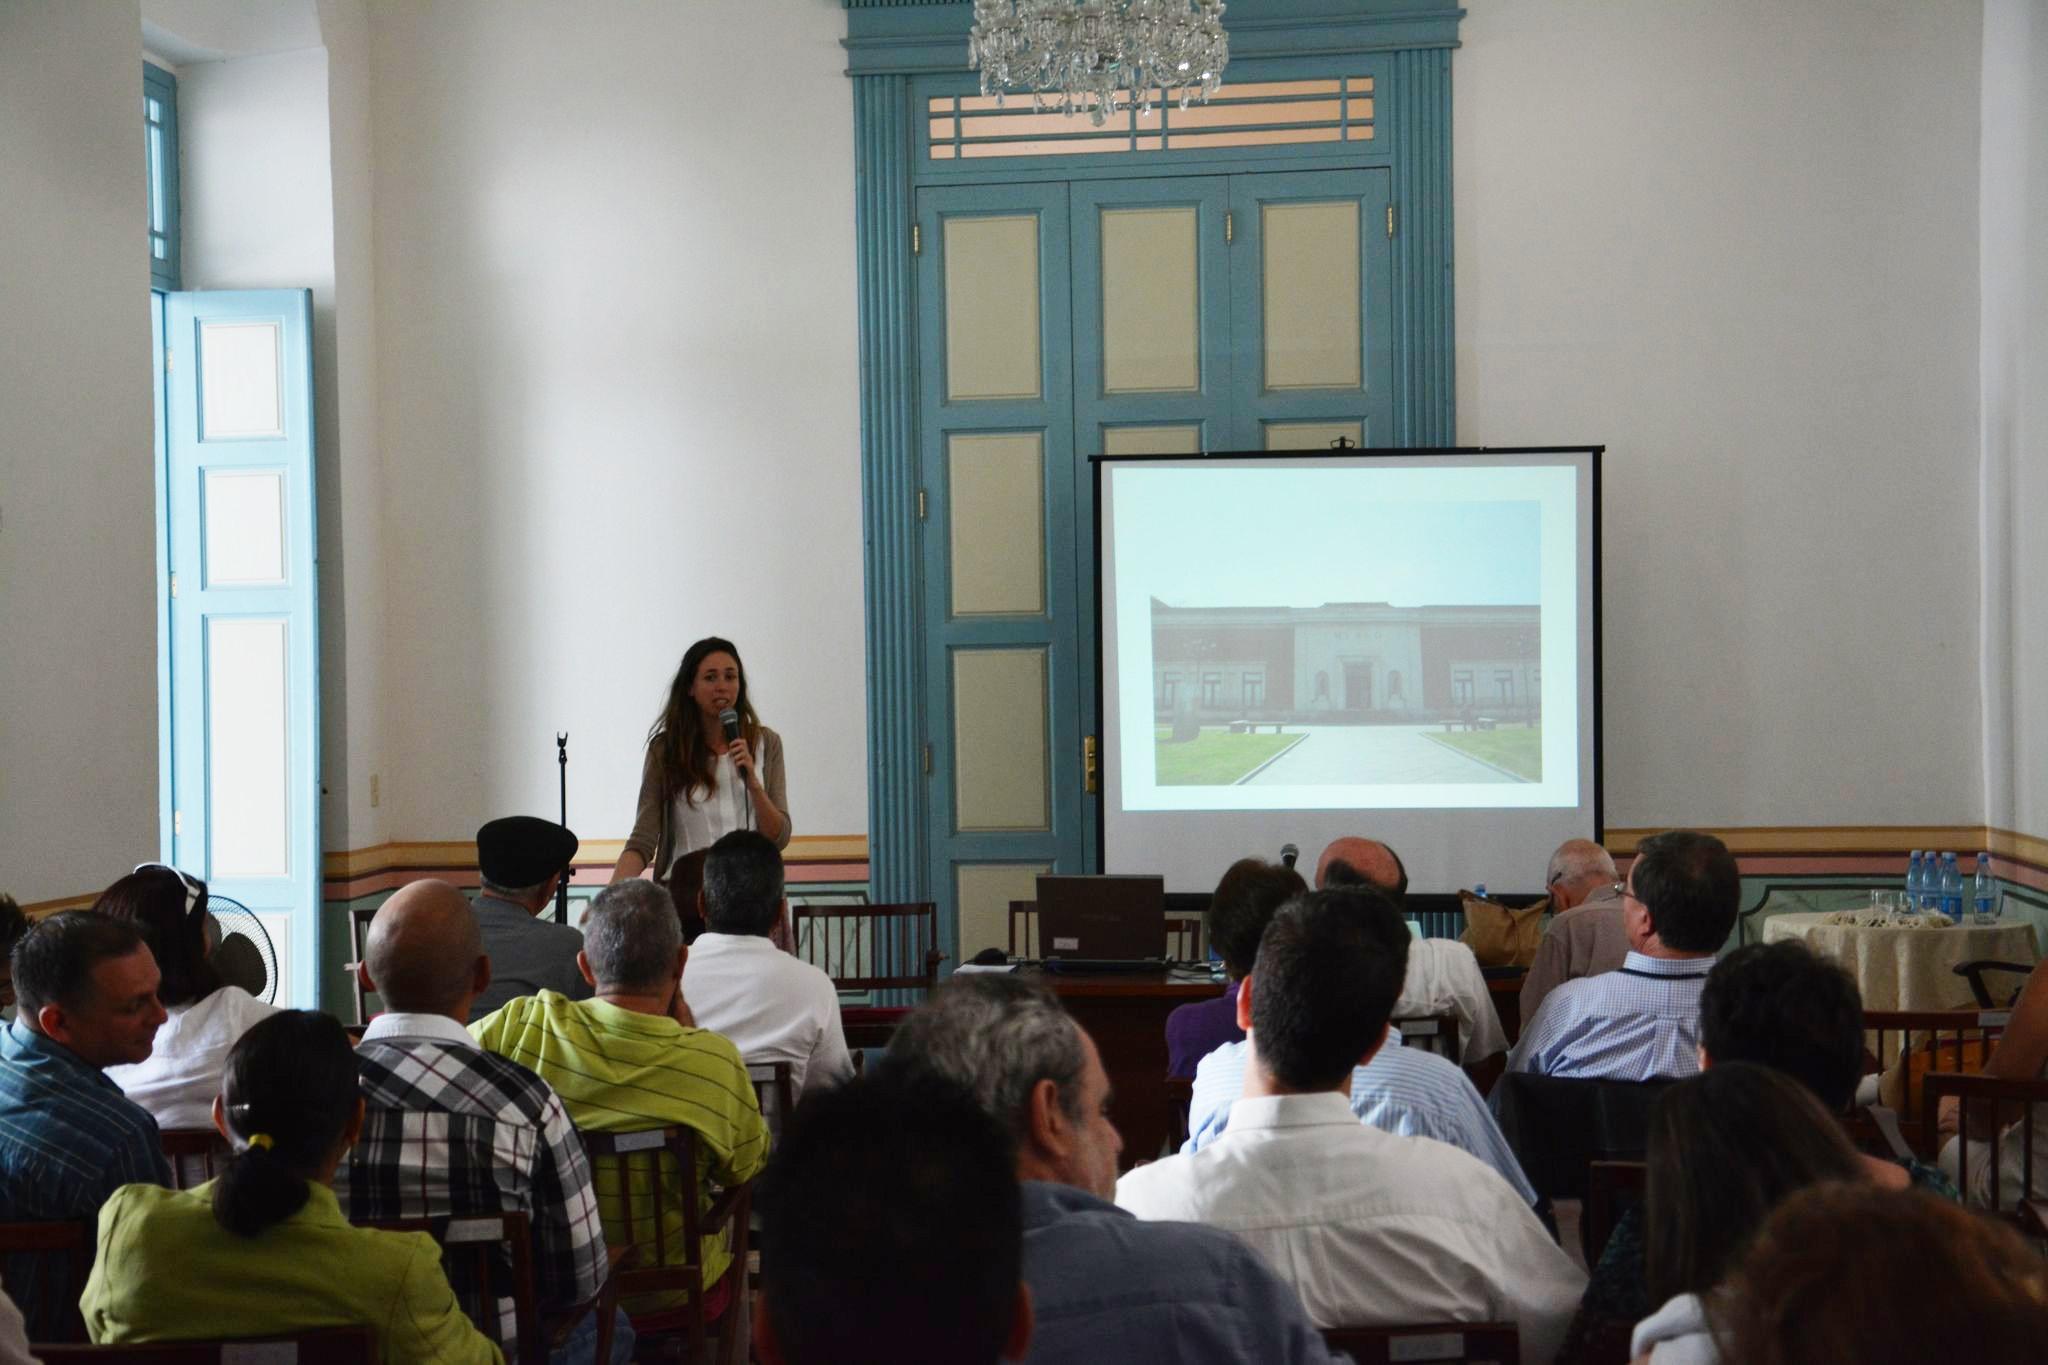 XI jornadas arquitectura vernacula gonzalo de cardenas_conferencia_libe fdez fernandez torrontegui